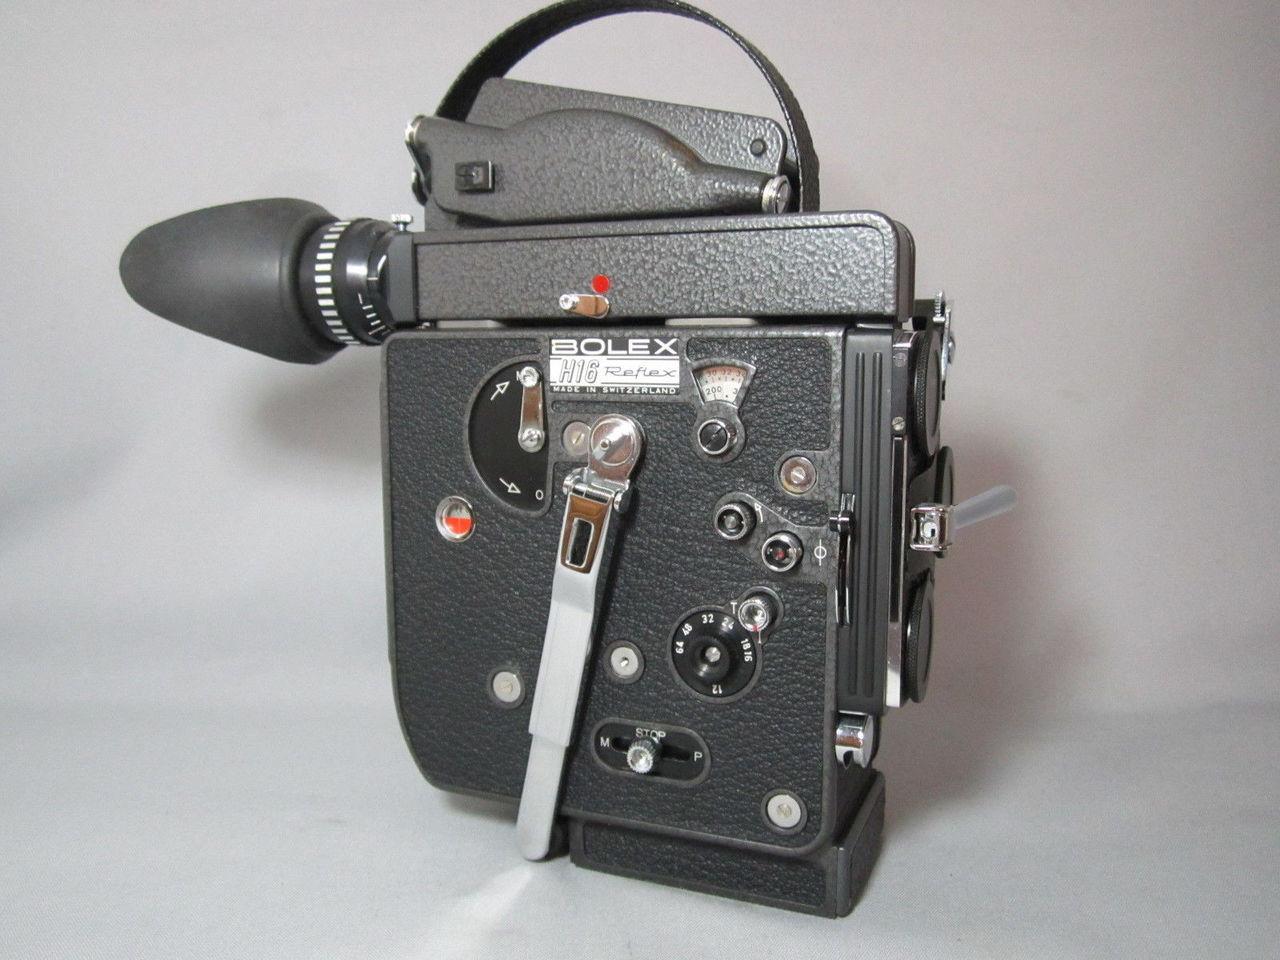 NEW Super-16 - 13X Viewer Red Dot - Bolex Rex-5 H6 16mm Movie Camera